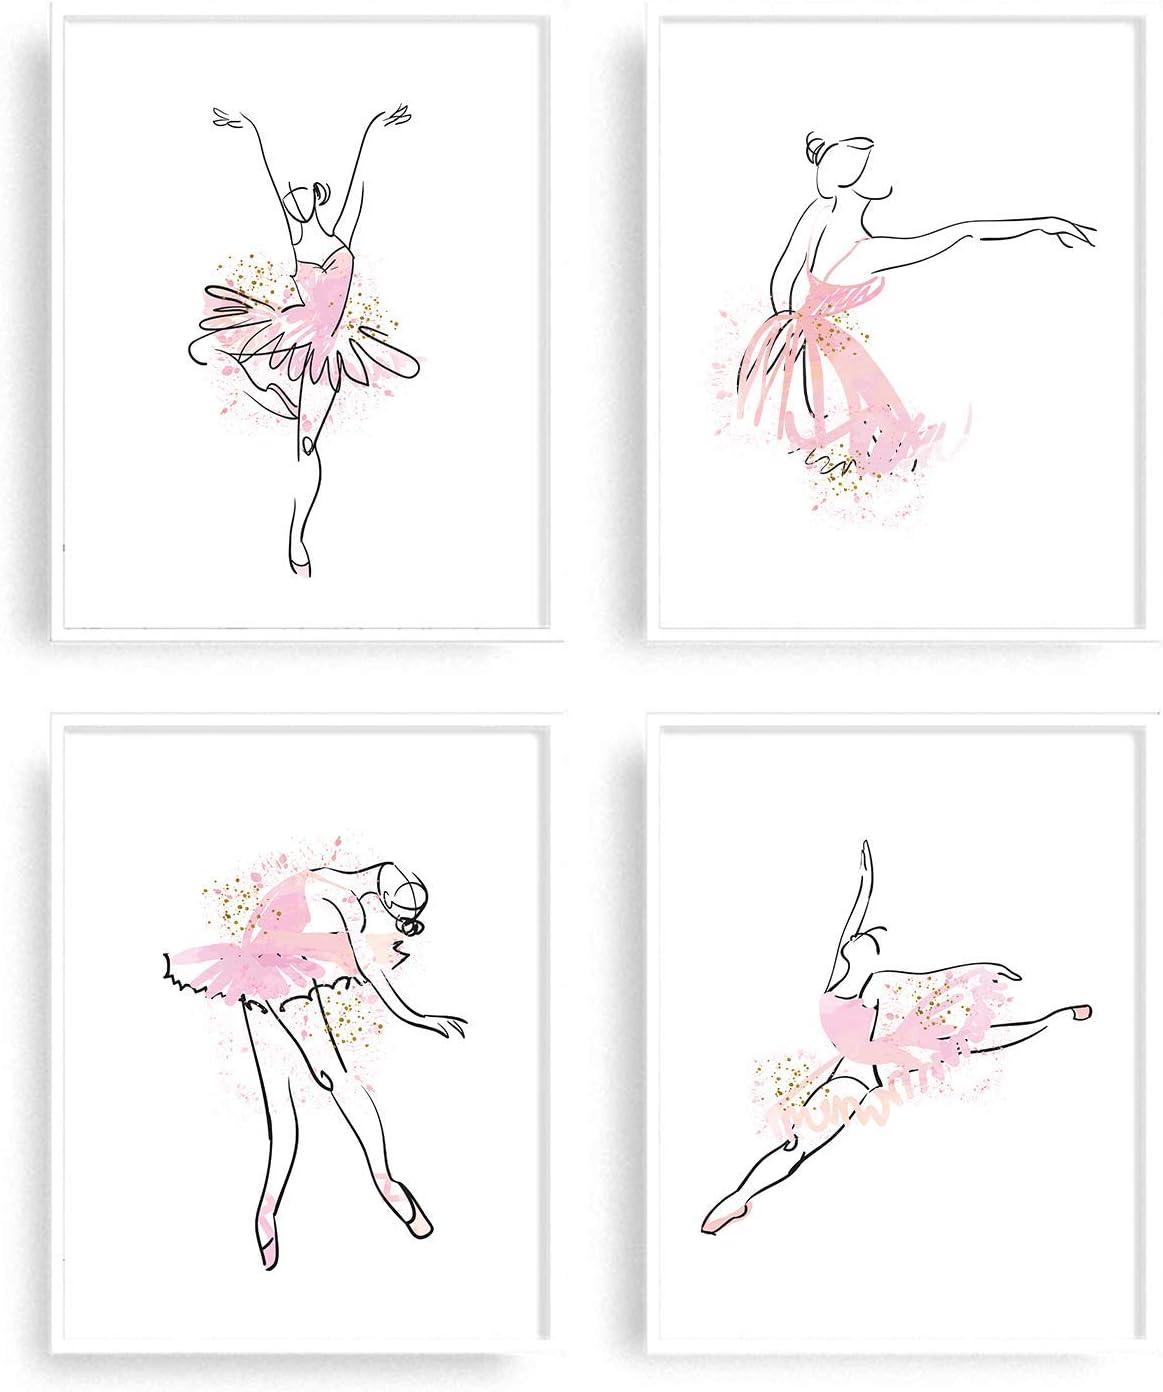 Ballerina wall decor for girls bedroom by KIU Designs - Set of 4 Art Prints of 8x10 Inch | ballet decorations for girls room | ballerina wall art | ballet wall decor | Teenage Girl Room Decor | dancer wall decor